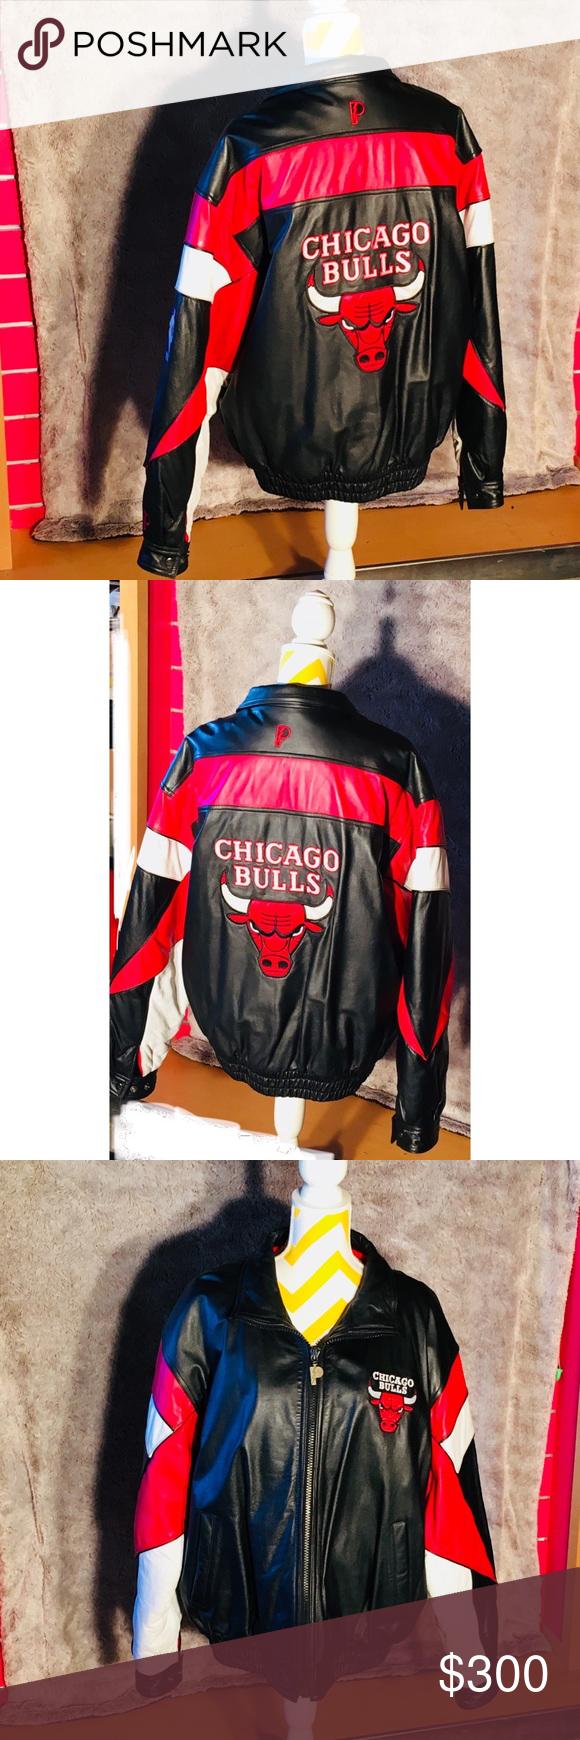 Vintage Pristine 80's Chicago Bulls Leather jacket Near